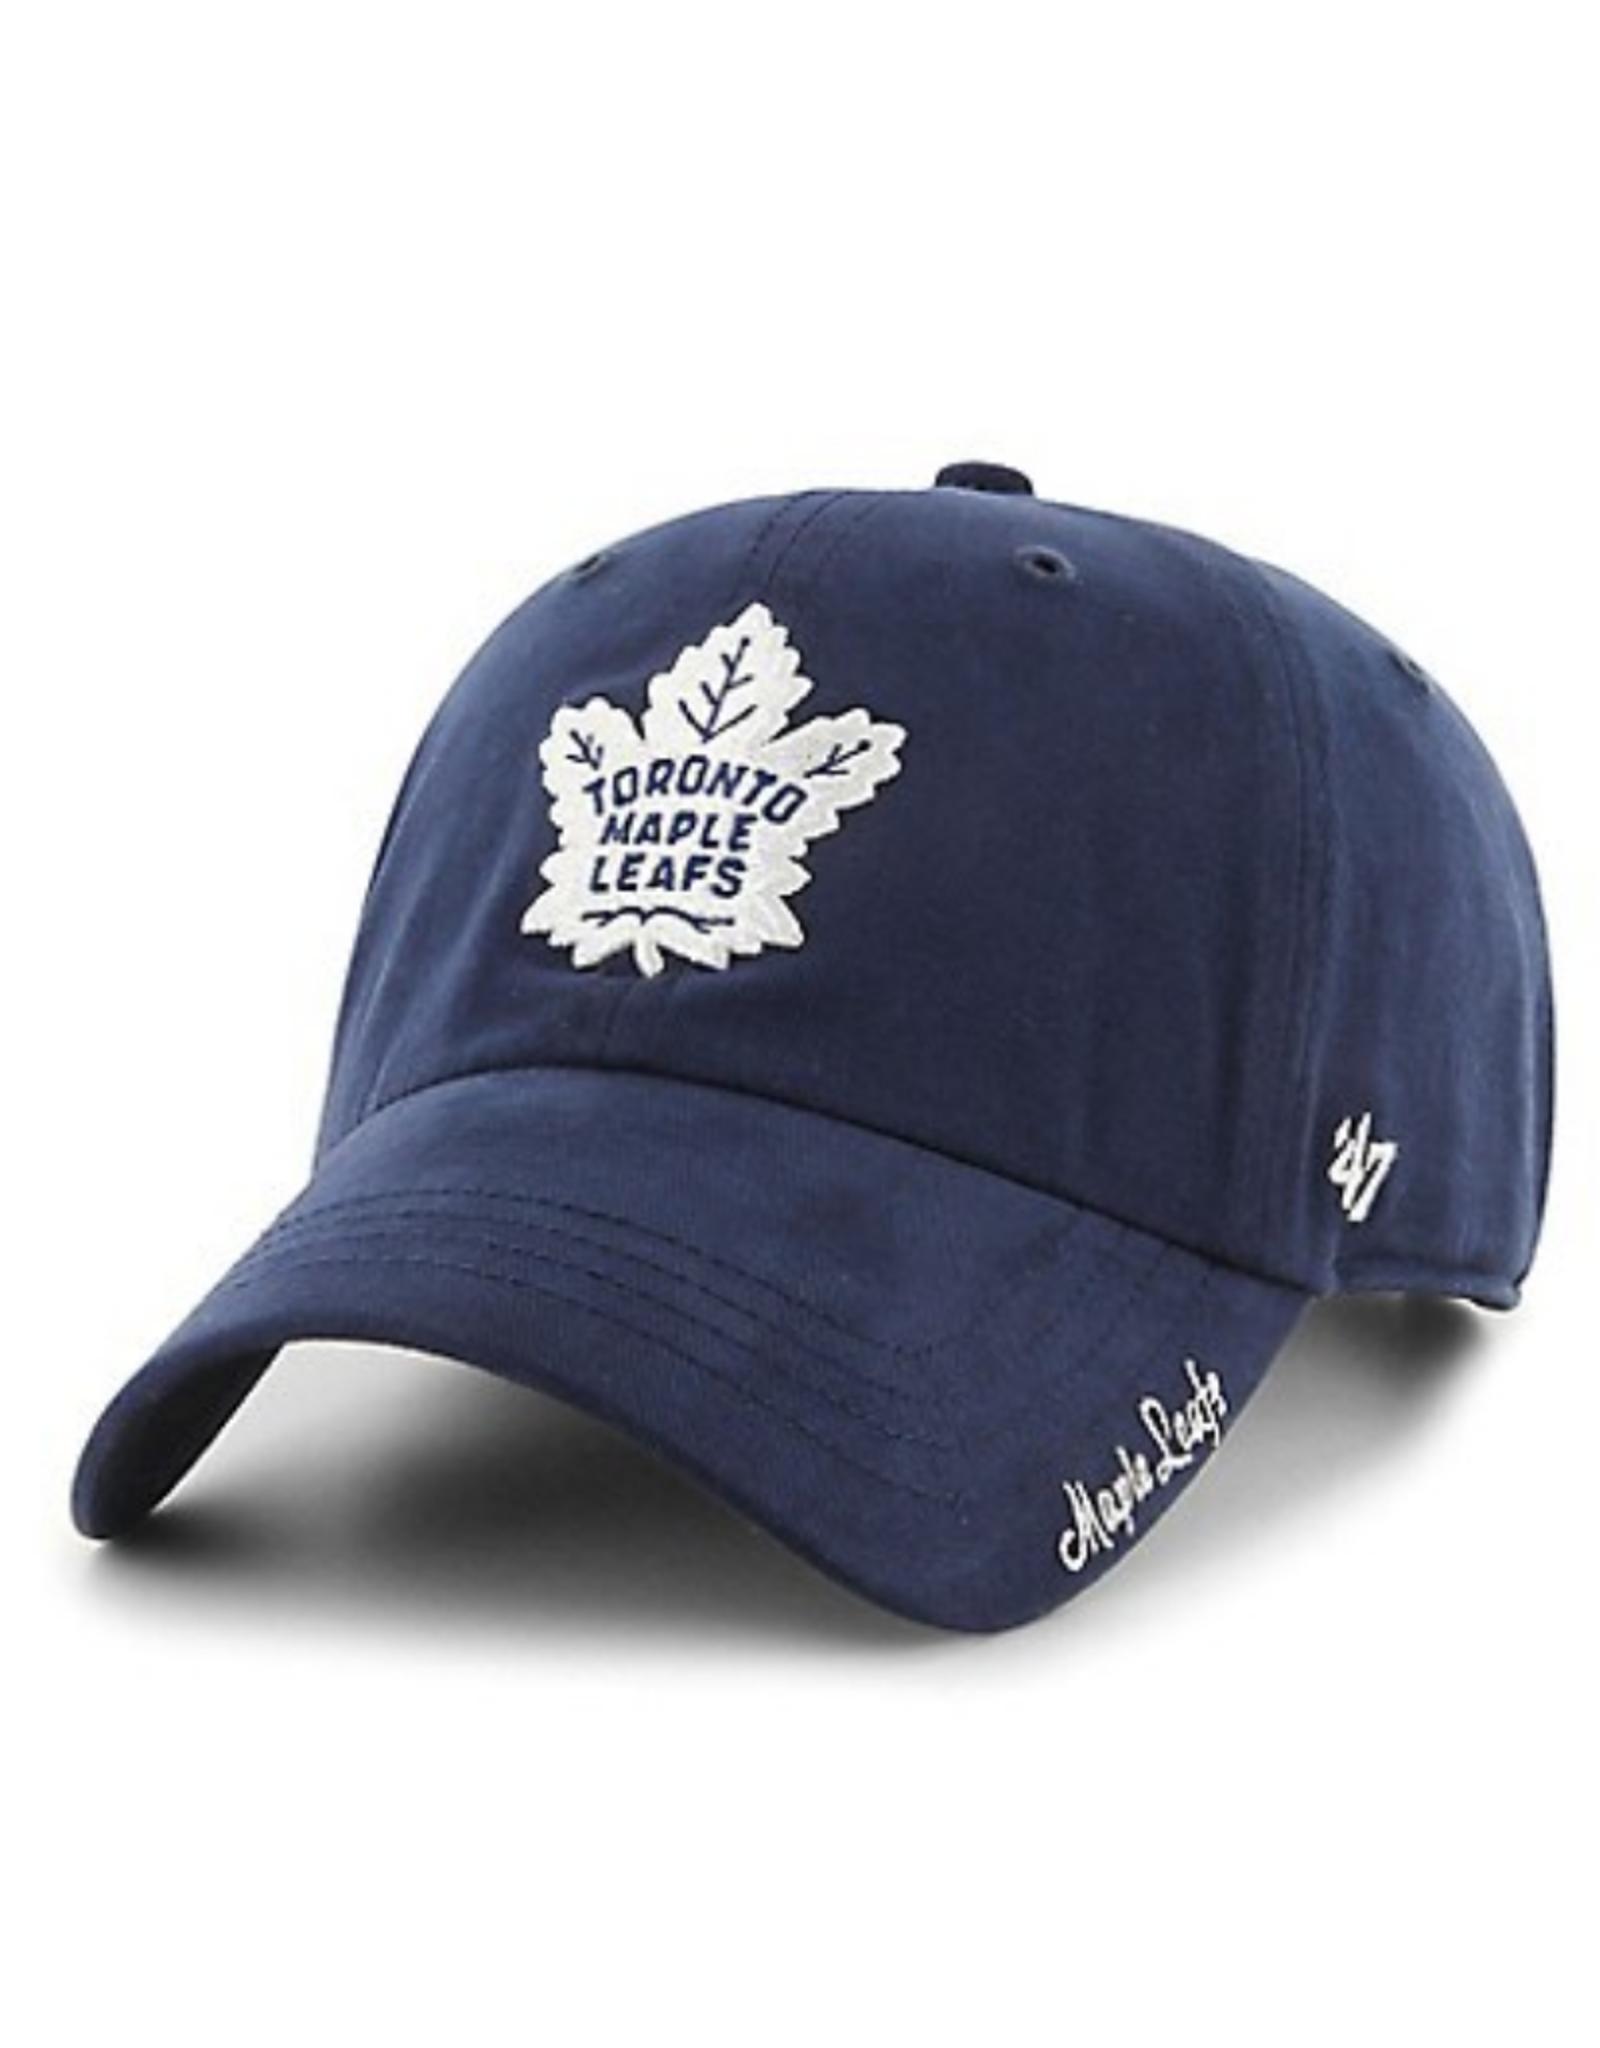 '47 Women's Miata Clean Up Adjustable Hat Toronto Maple Leafs